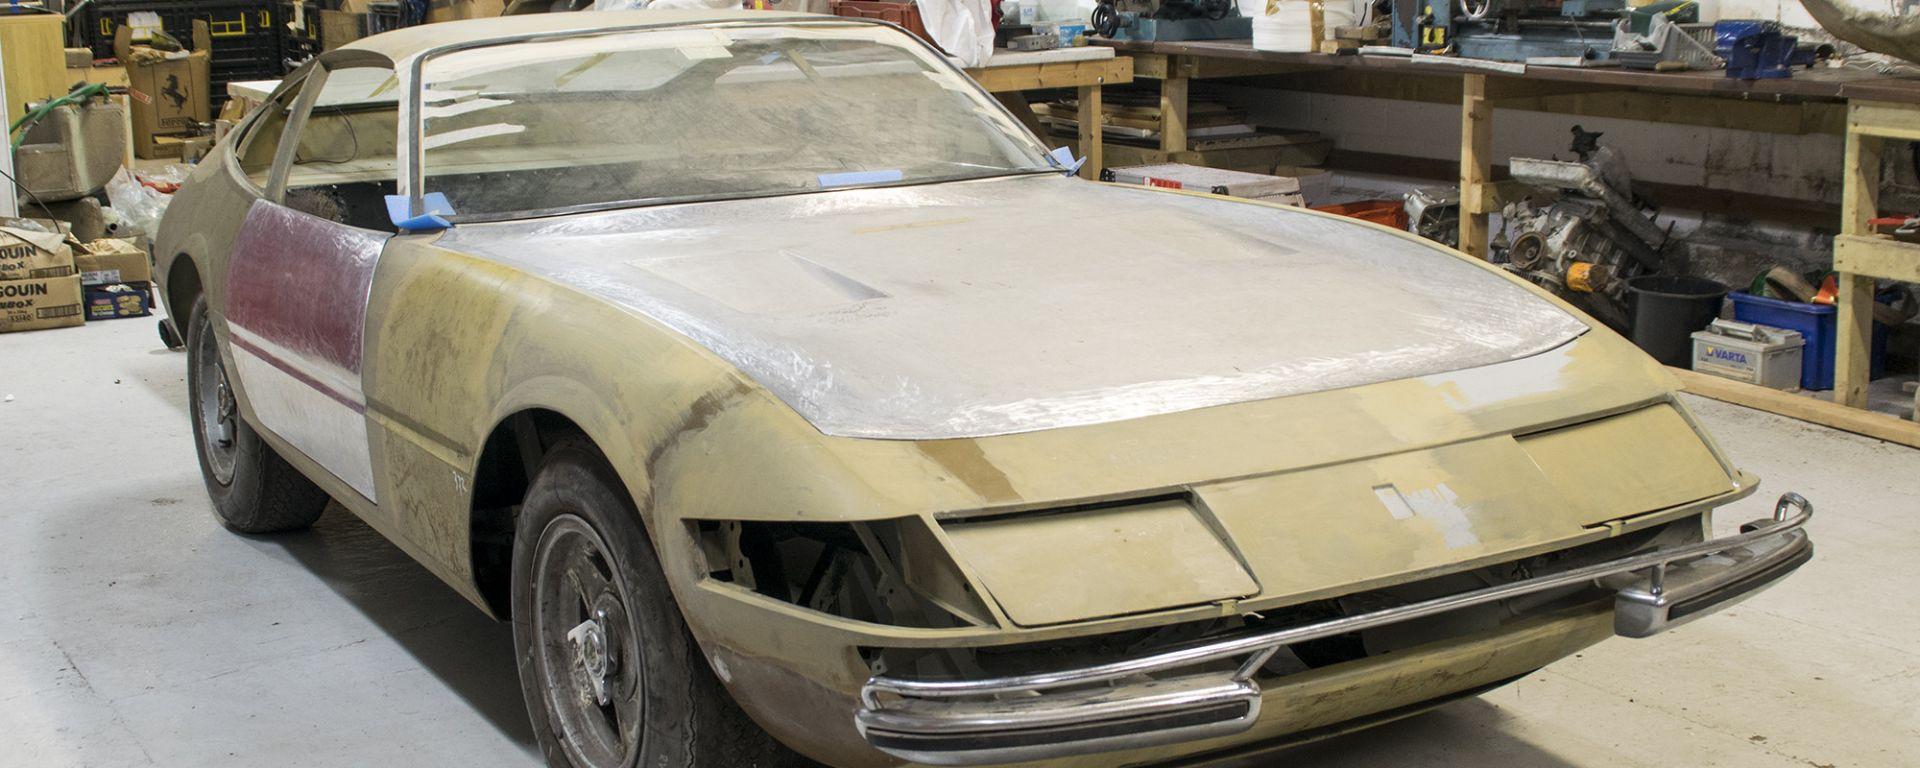 La Ferrari 365 GTB/4 Daytona da ricostruire